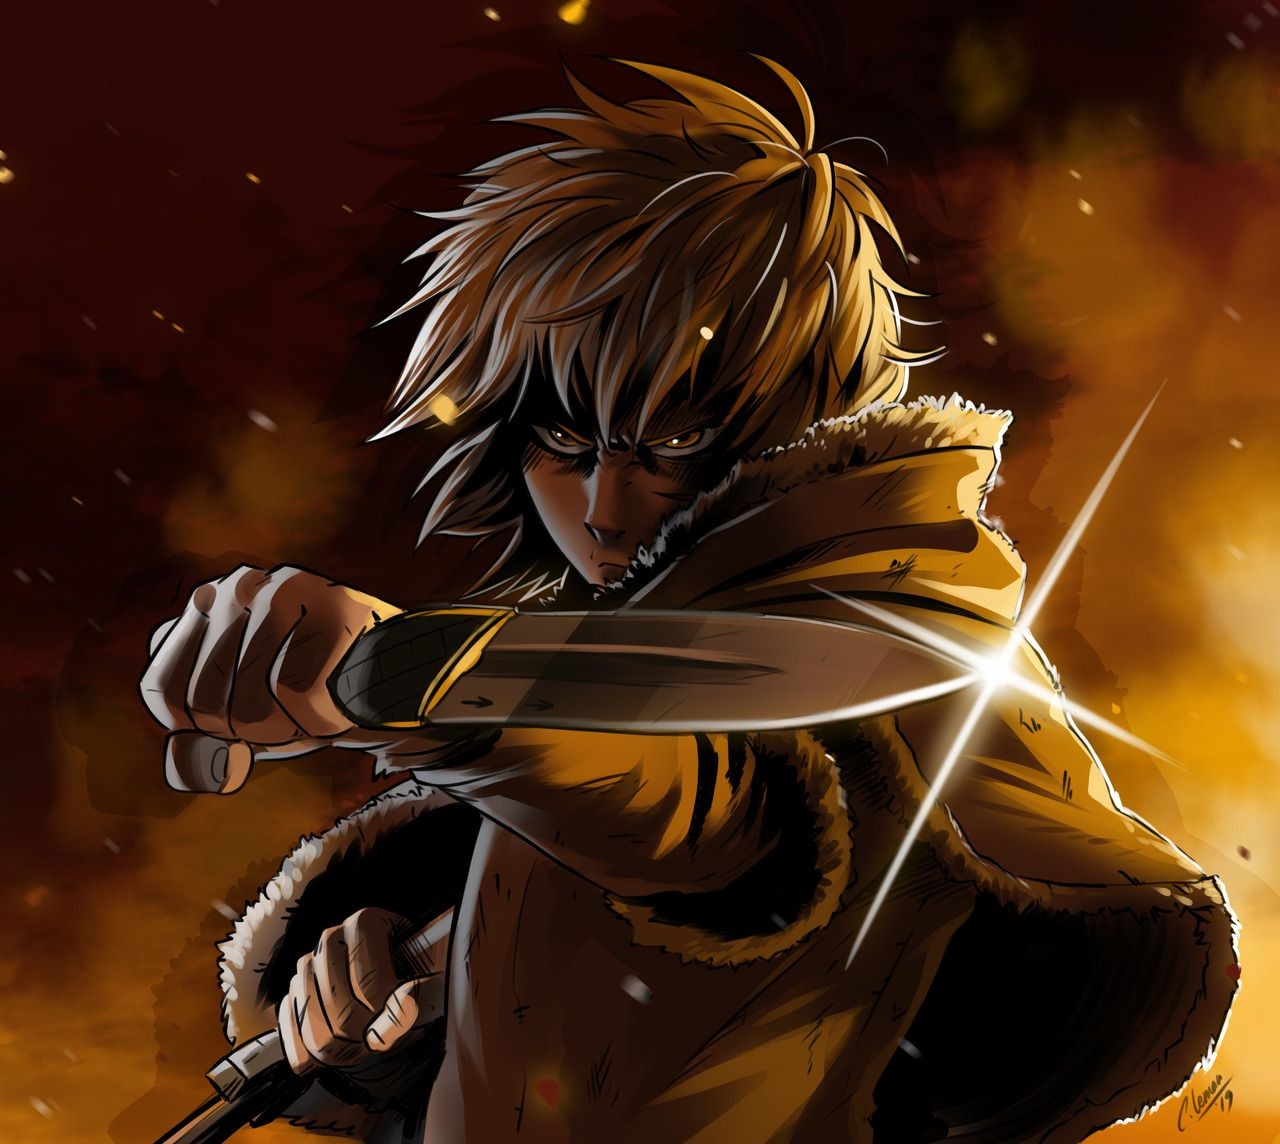 Thorfinn Karlsefni ! em 2020 Otaku anime, Tudo anime, Anime